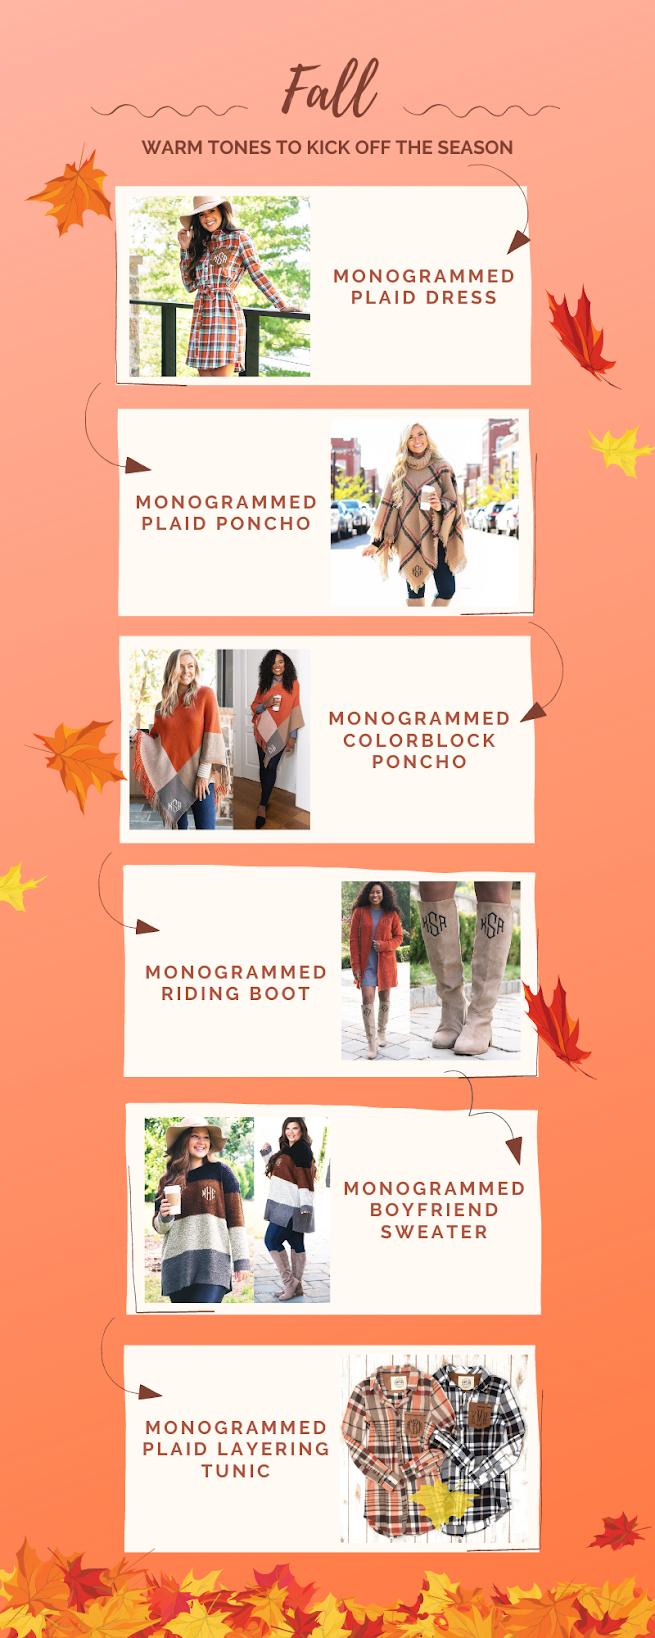 Fall warm tones to kick off the season